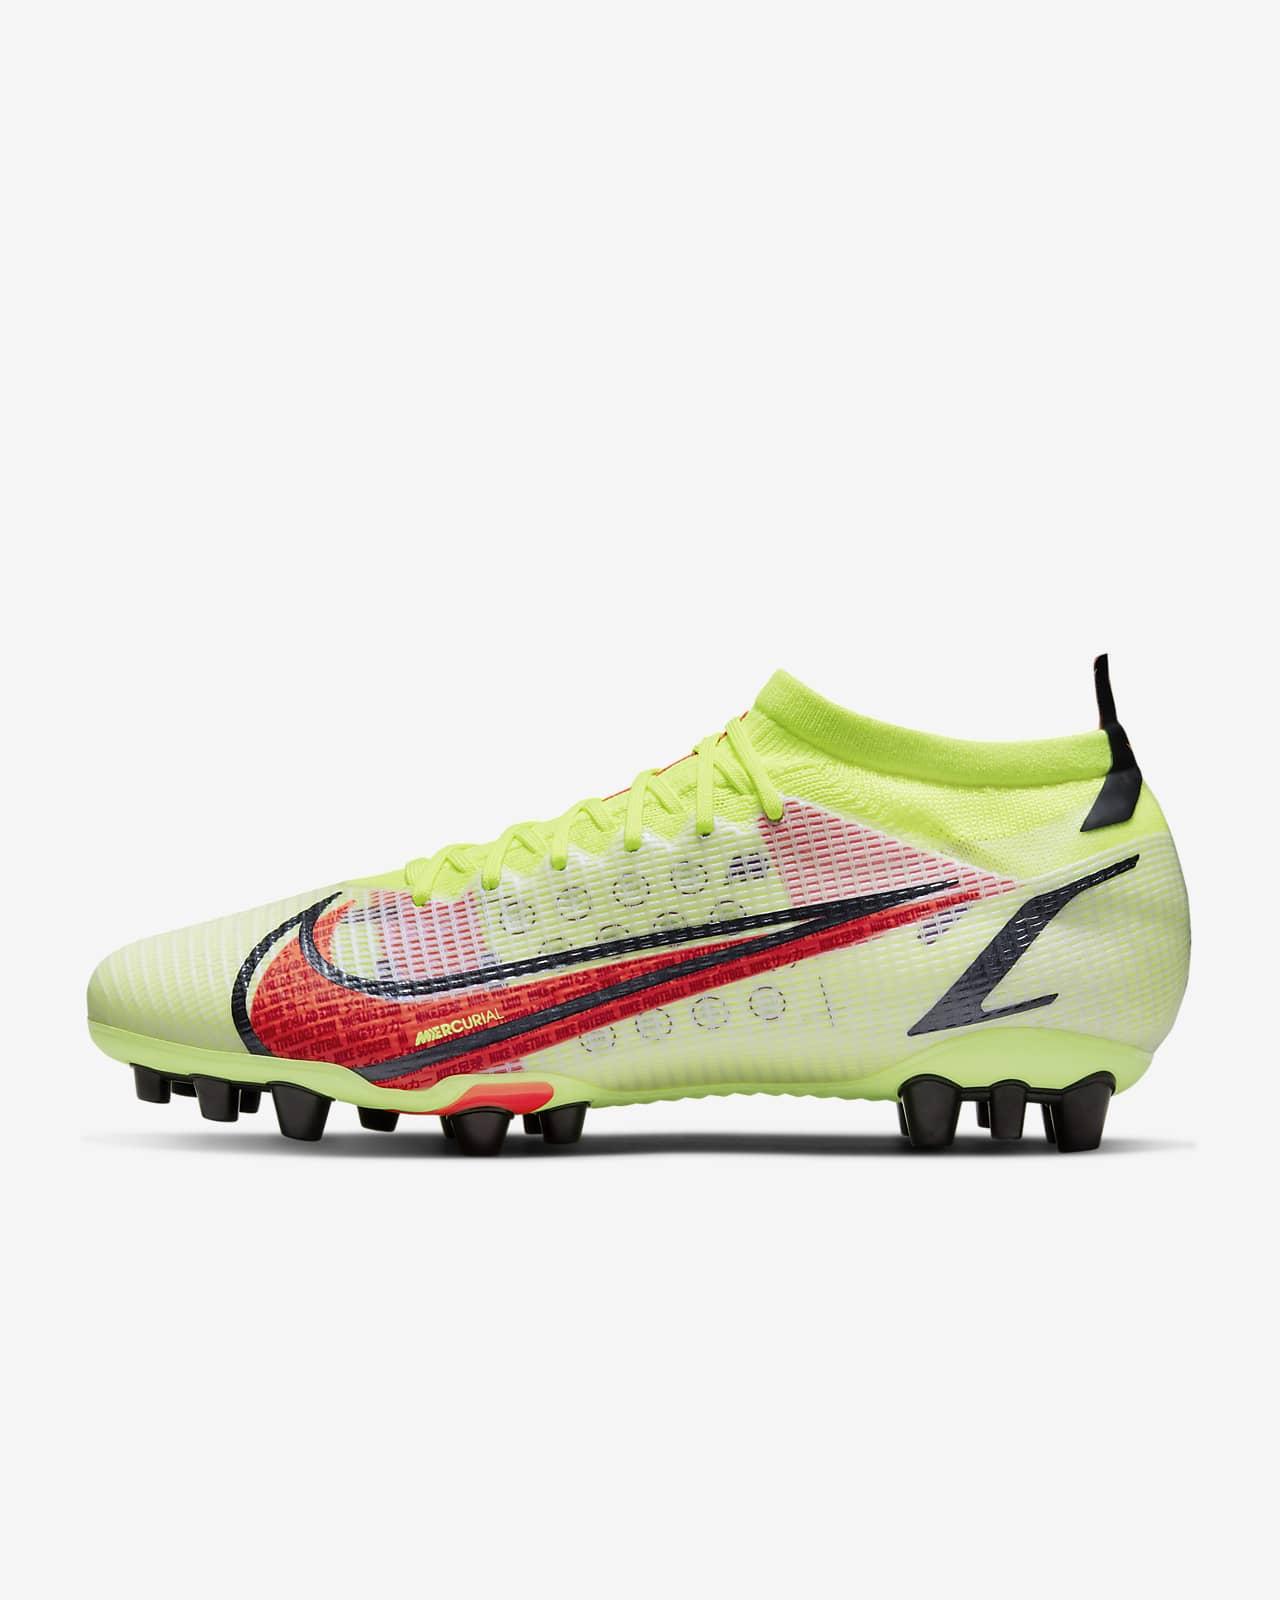 Nike Mercurial Vapor 14 Pro AG Fußballschuh für Kunstrasen